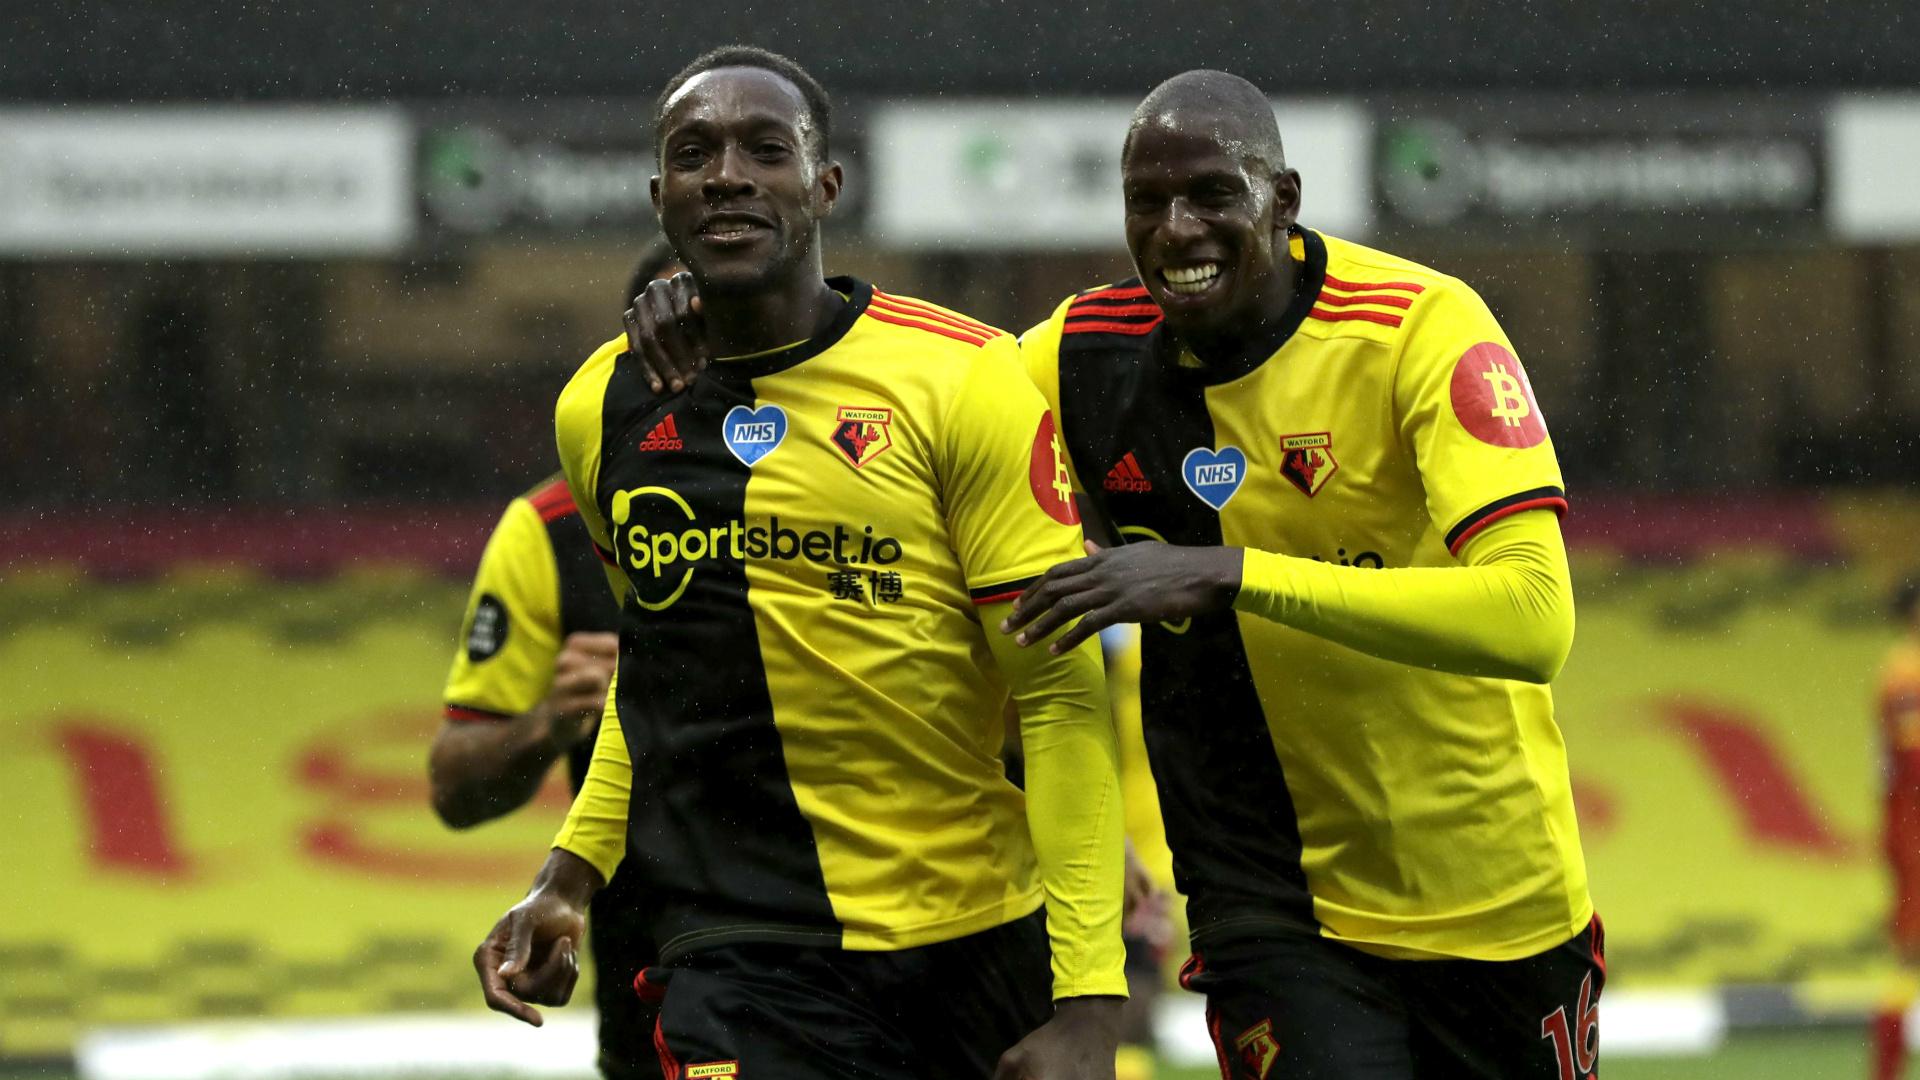 Watford 2-1 Norwich City: Welbeck stunner boosts hosts' survival hopes